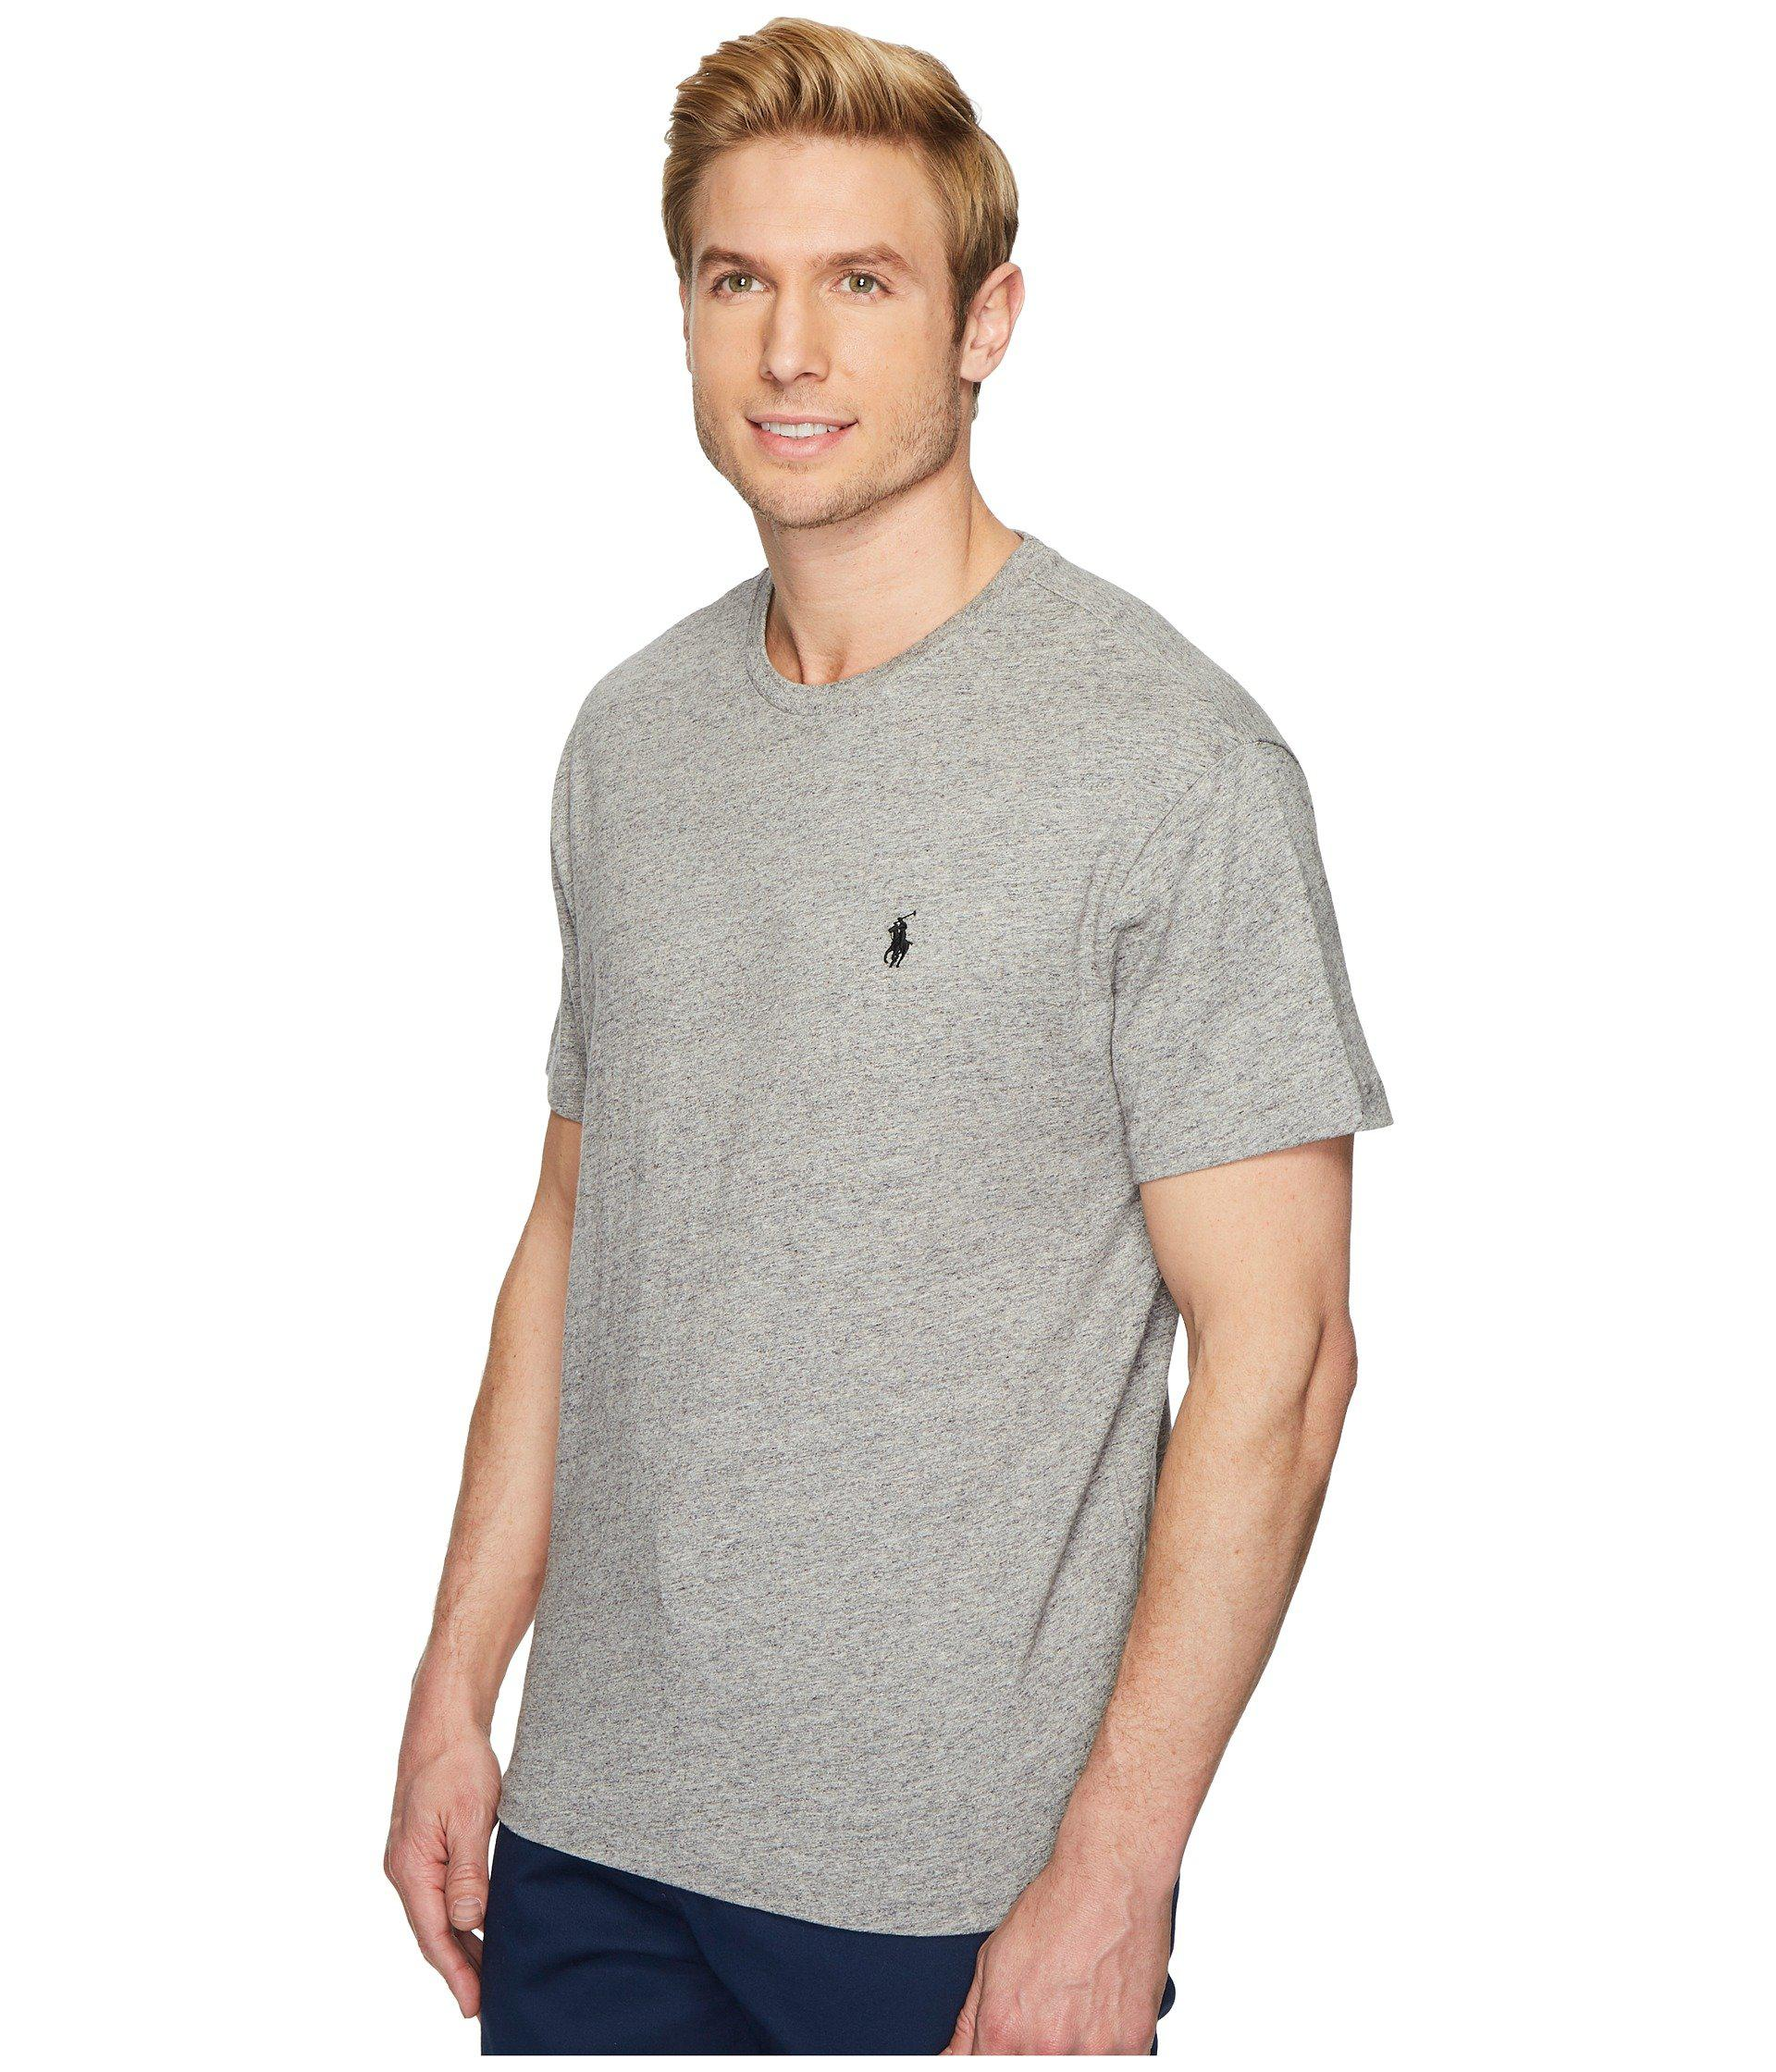 Lyst Polo Ralph Lauren Classic Fit Crew Neck T Shirt Rl Black